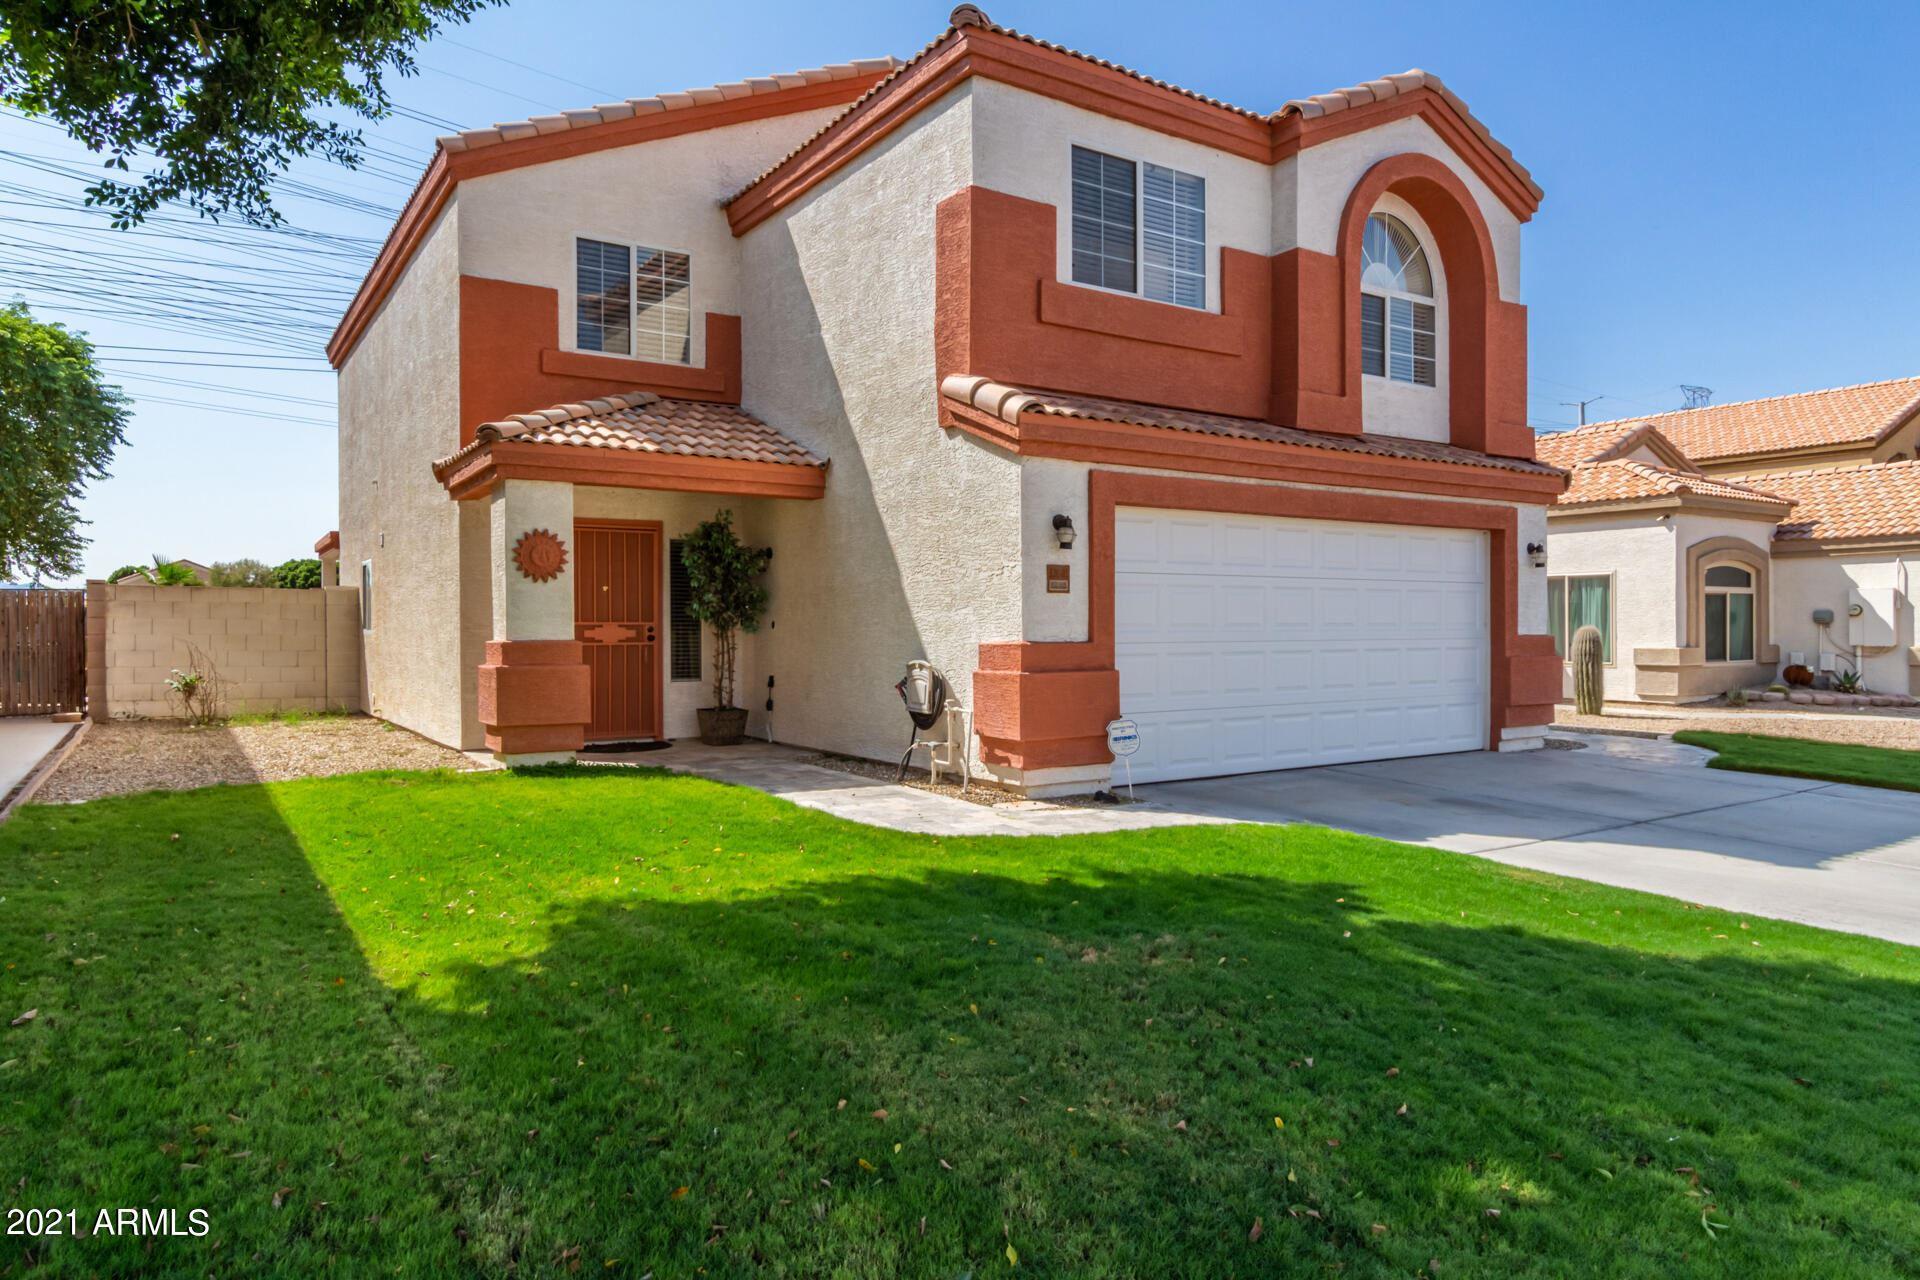 Photo of 12001 W GRANADA Road, Avondale, AZ 85392 (MLS # 6300296)